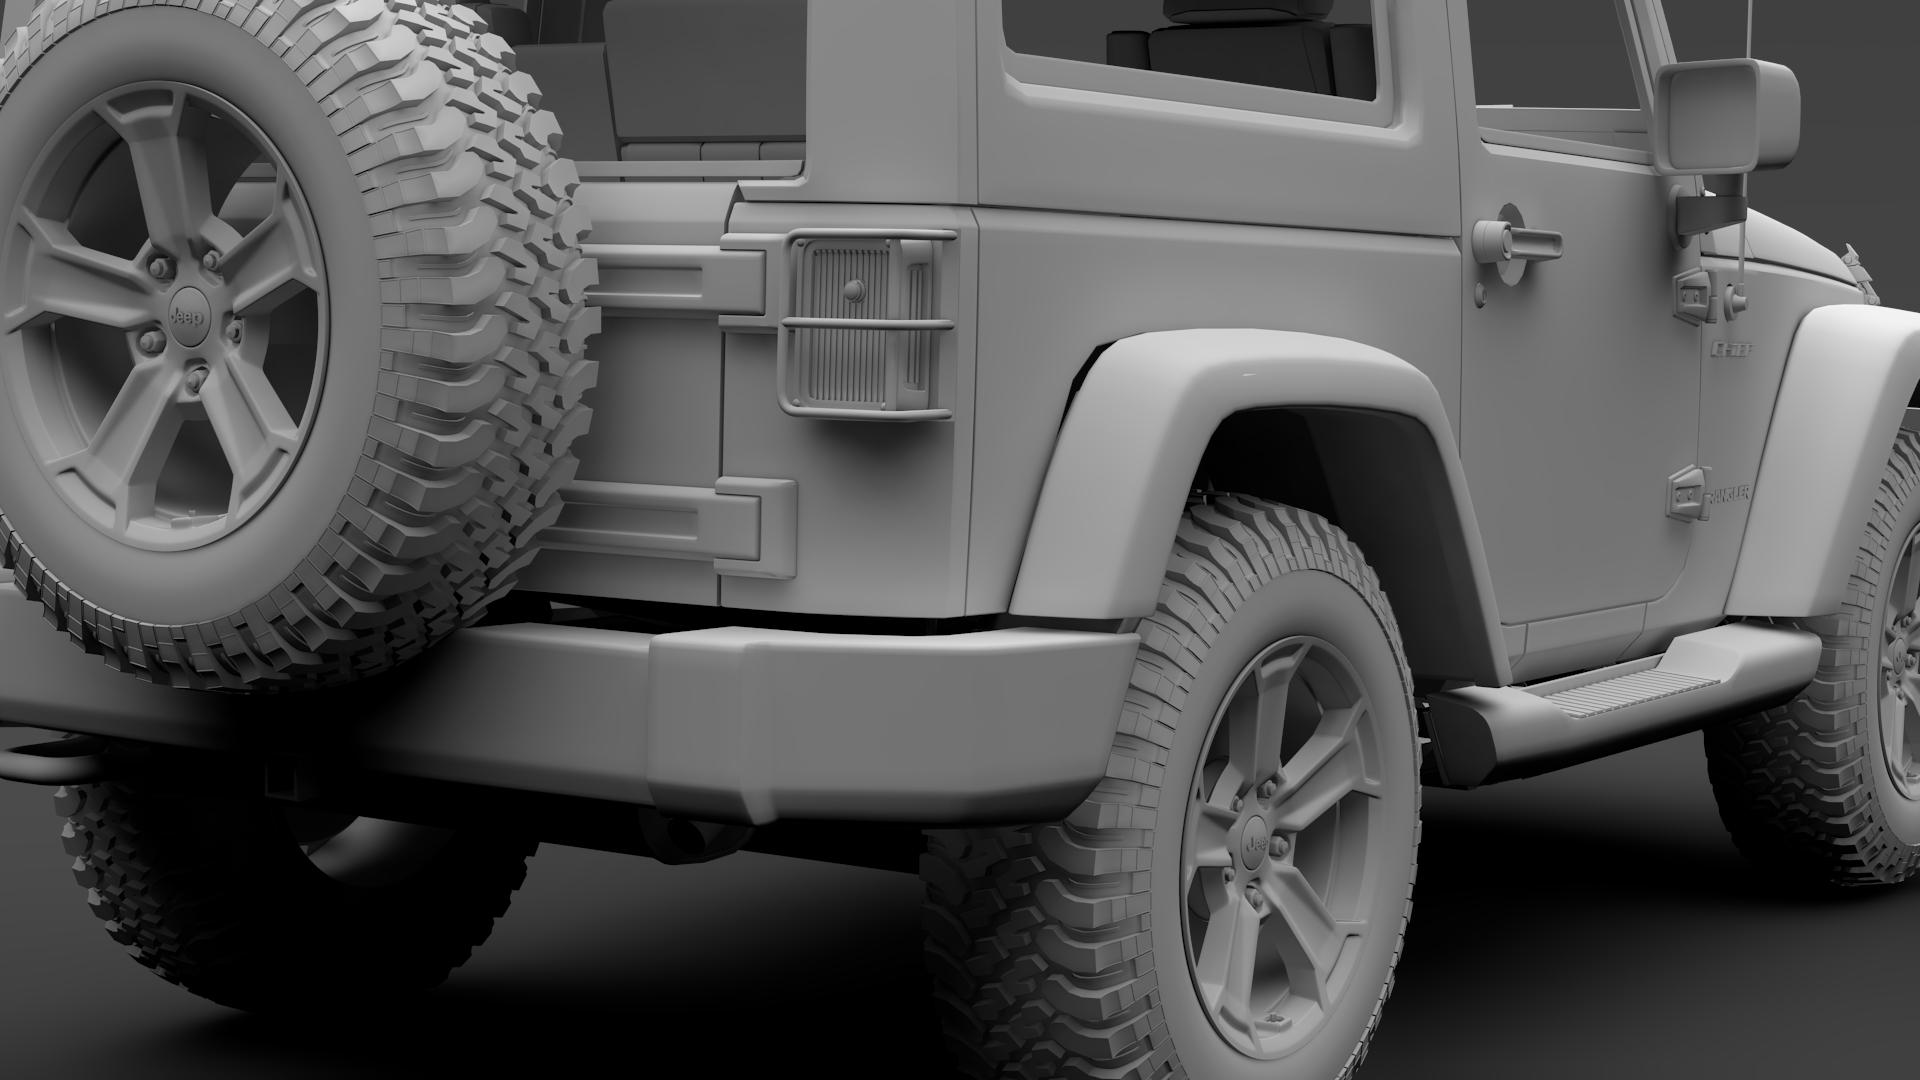 jeep wrangler chief jk 2017 3d model max fbx c4d lwo ma mb hrc xsi obj 276895